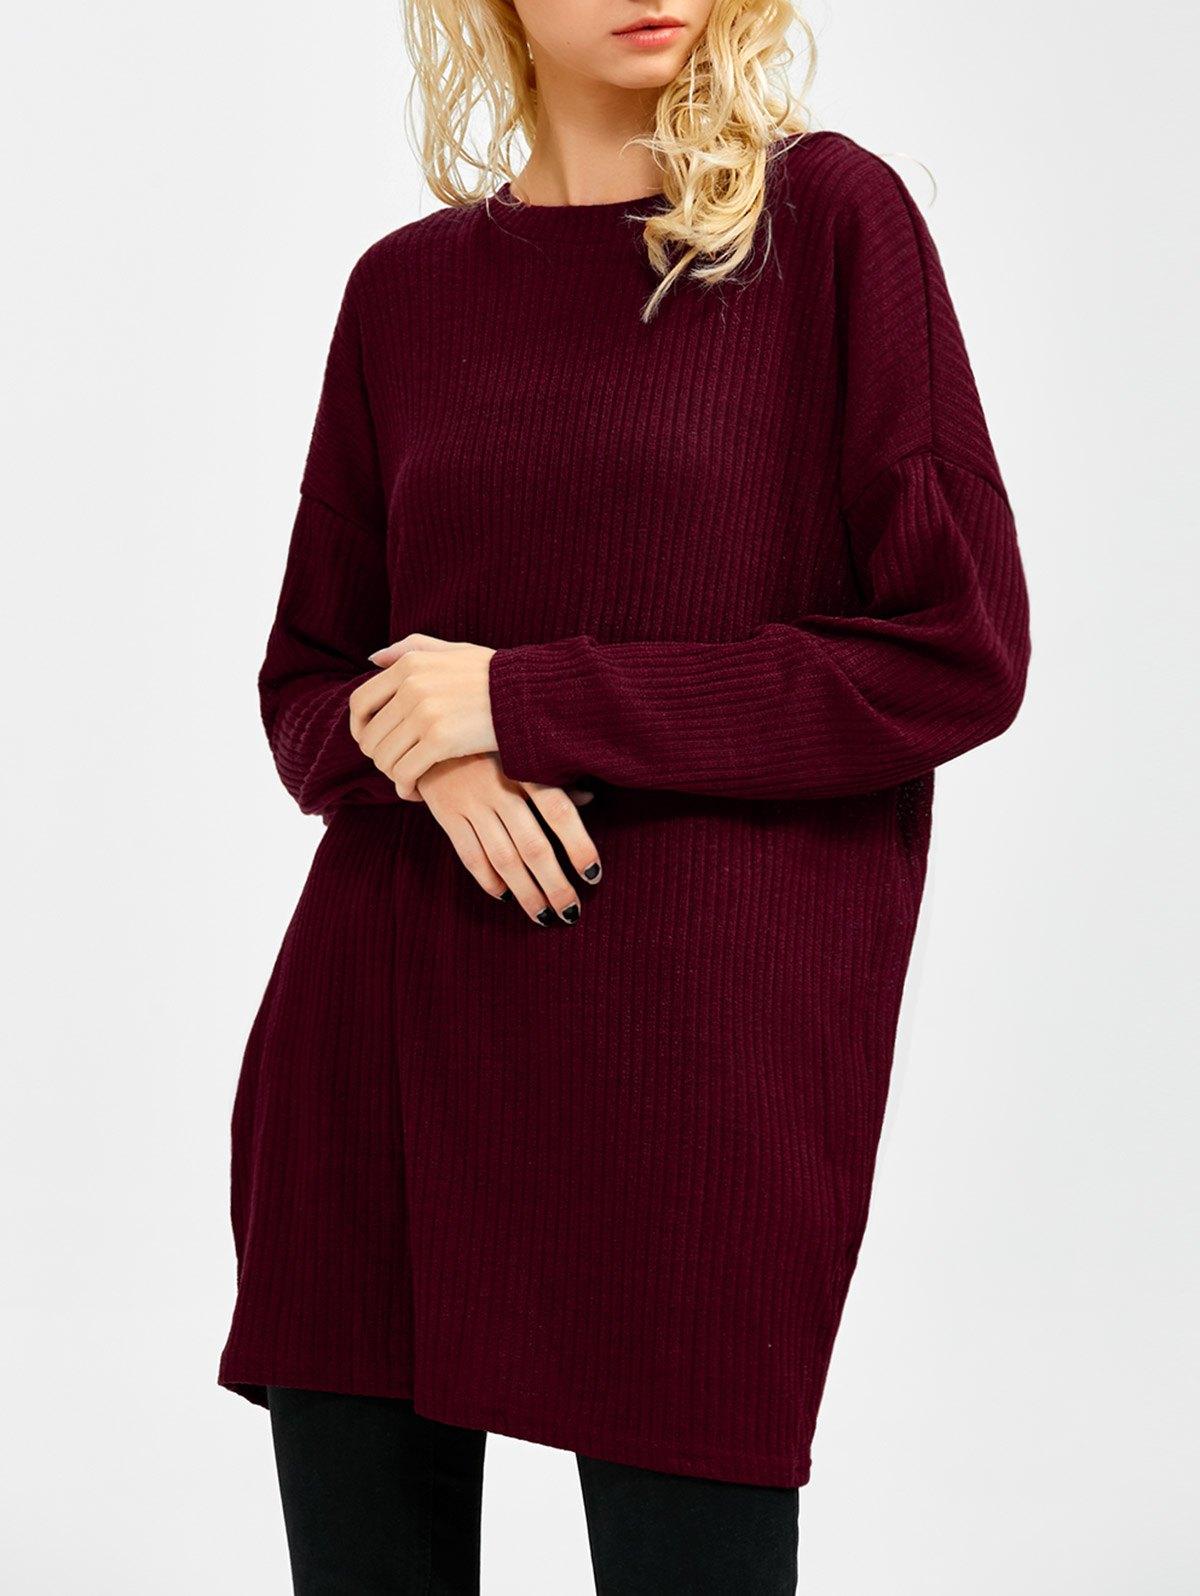 Skew Neck Long Sleeve Jumper - WINE RED L